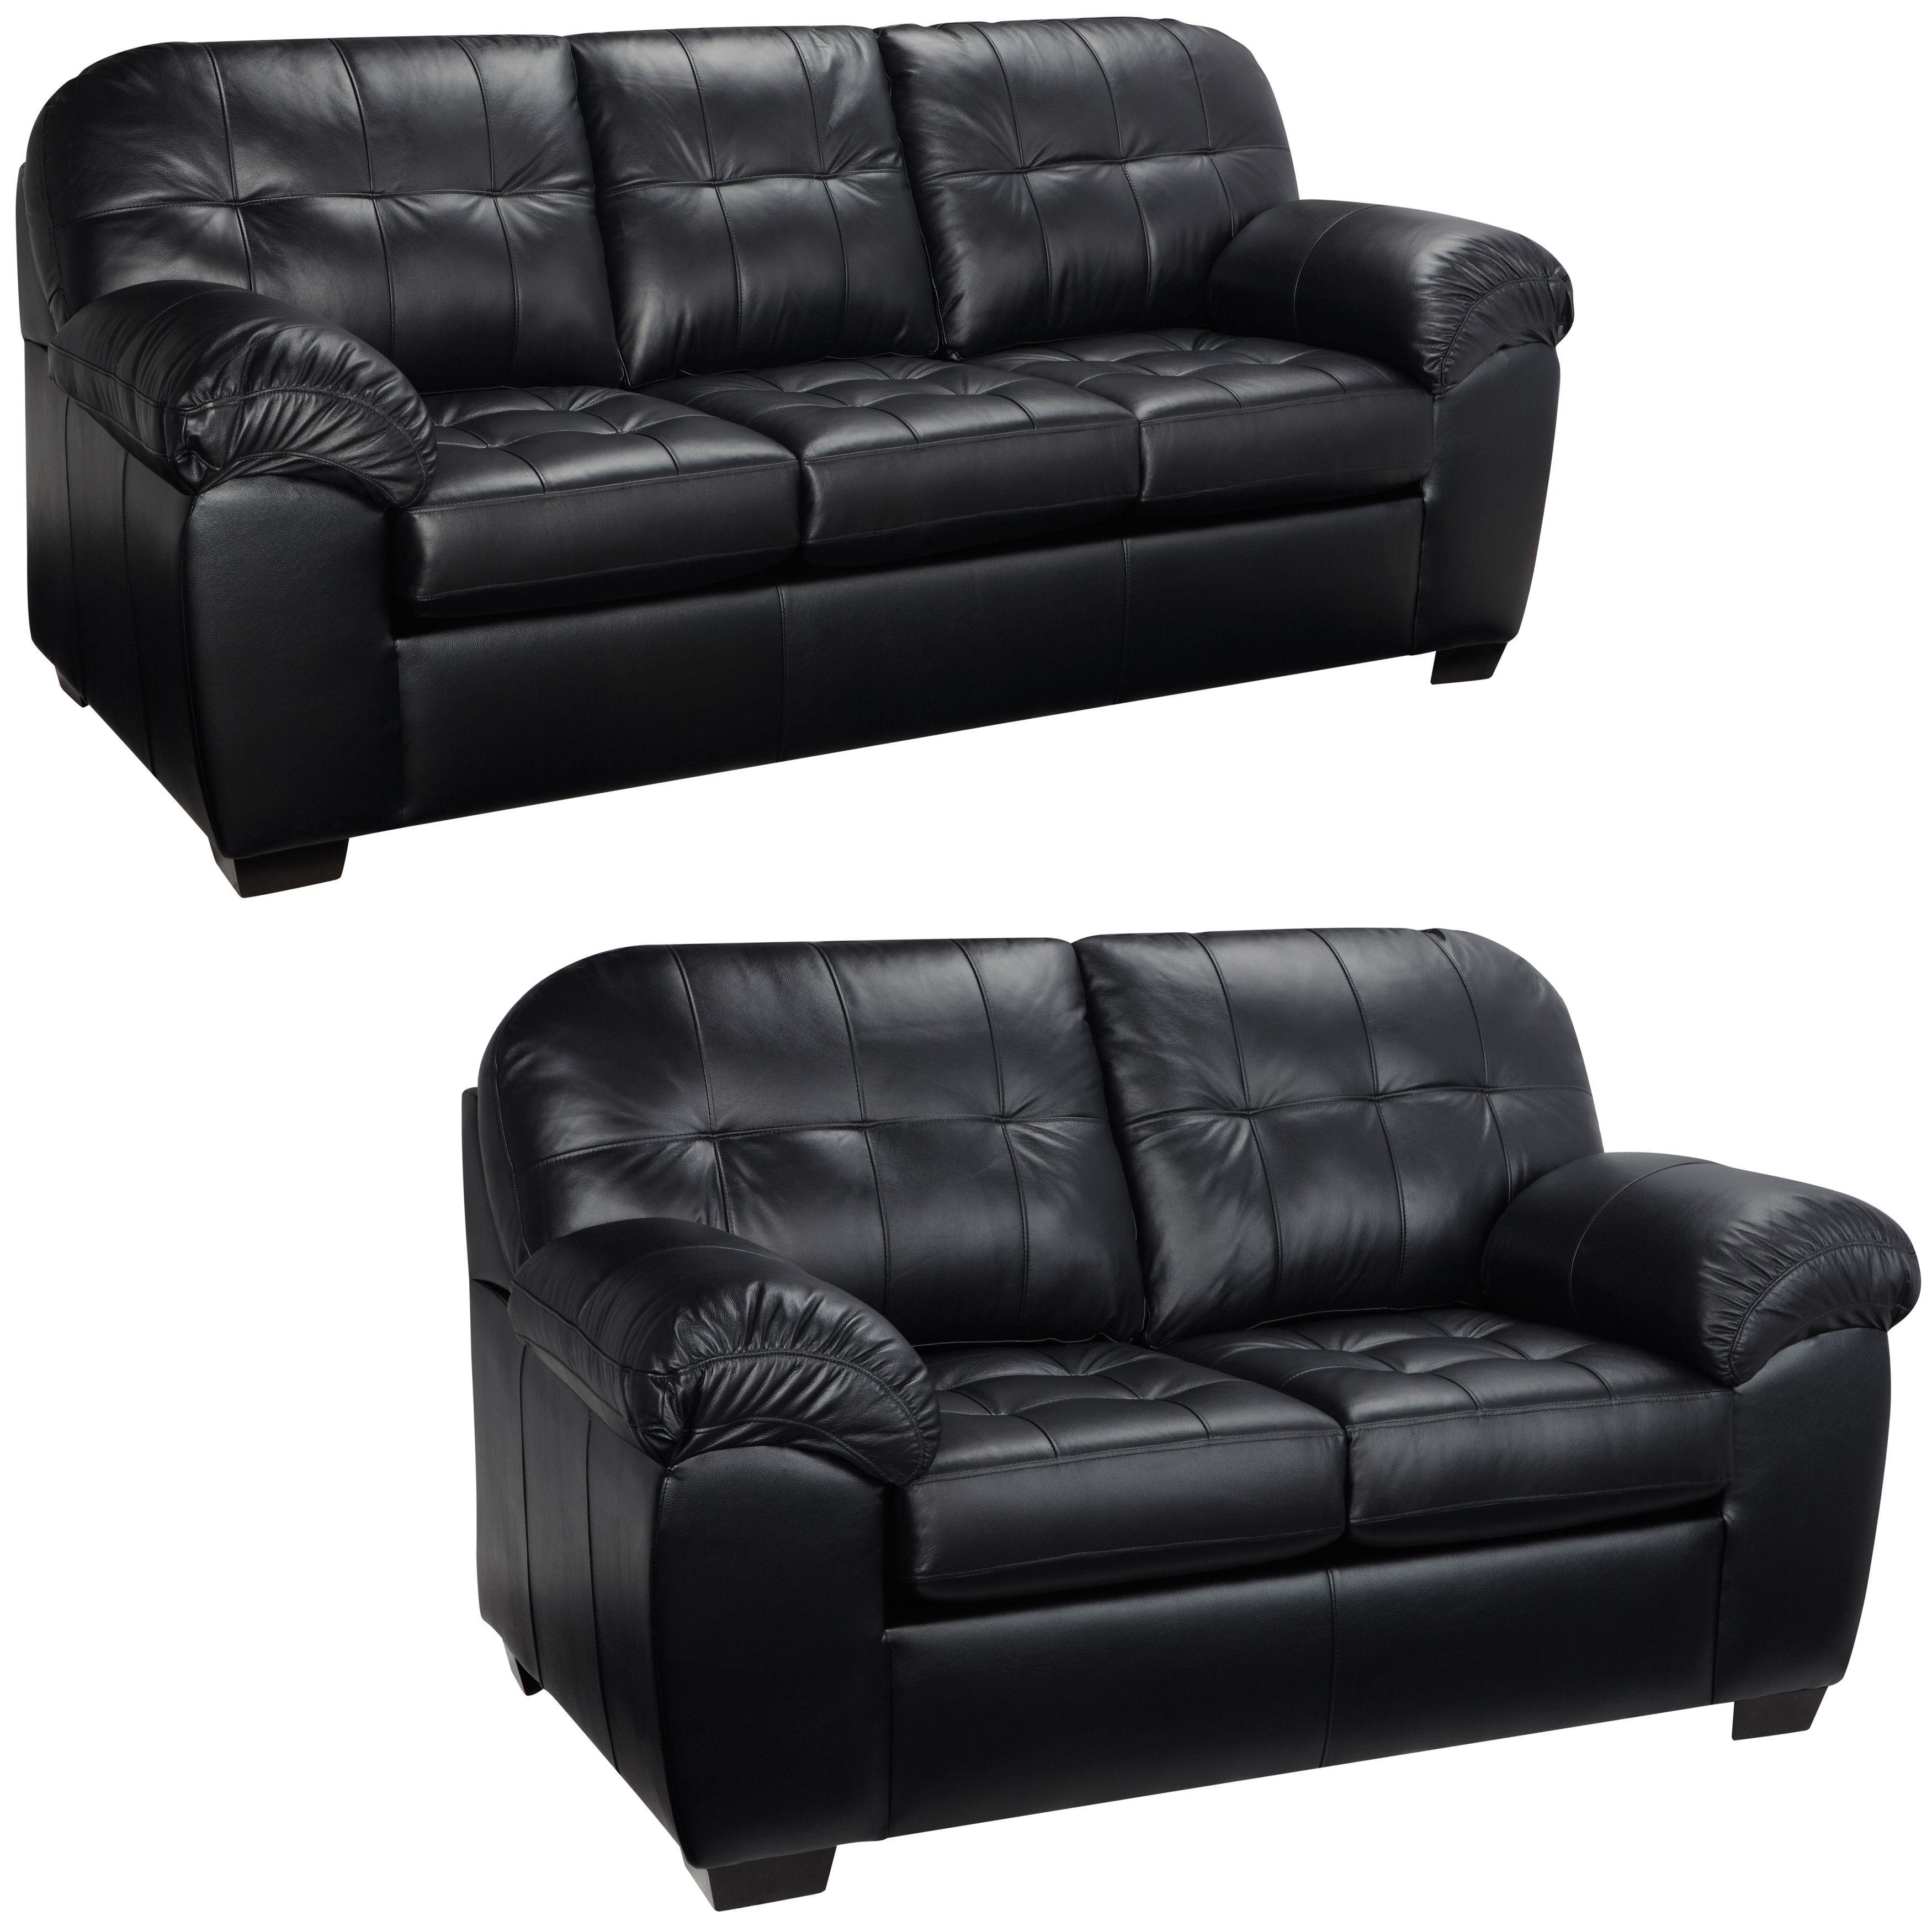 Emma Black Italian Leather Sofa and Loveseat Foam